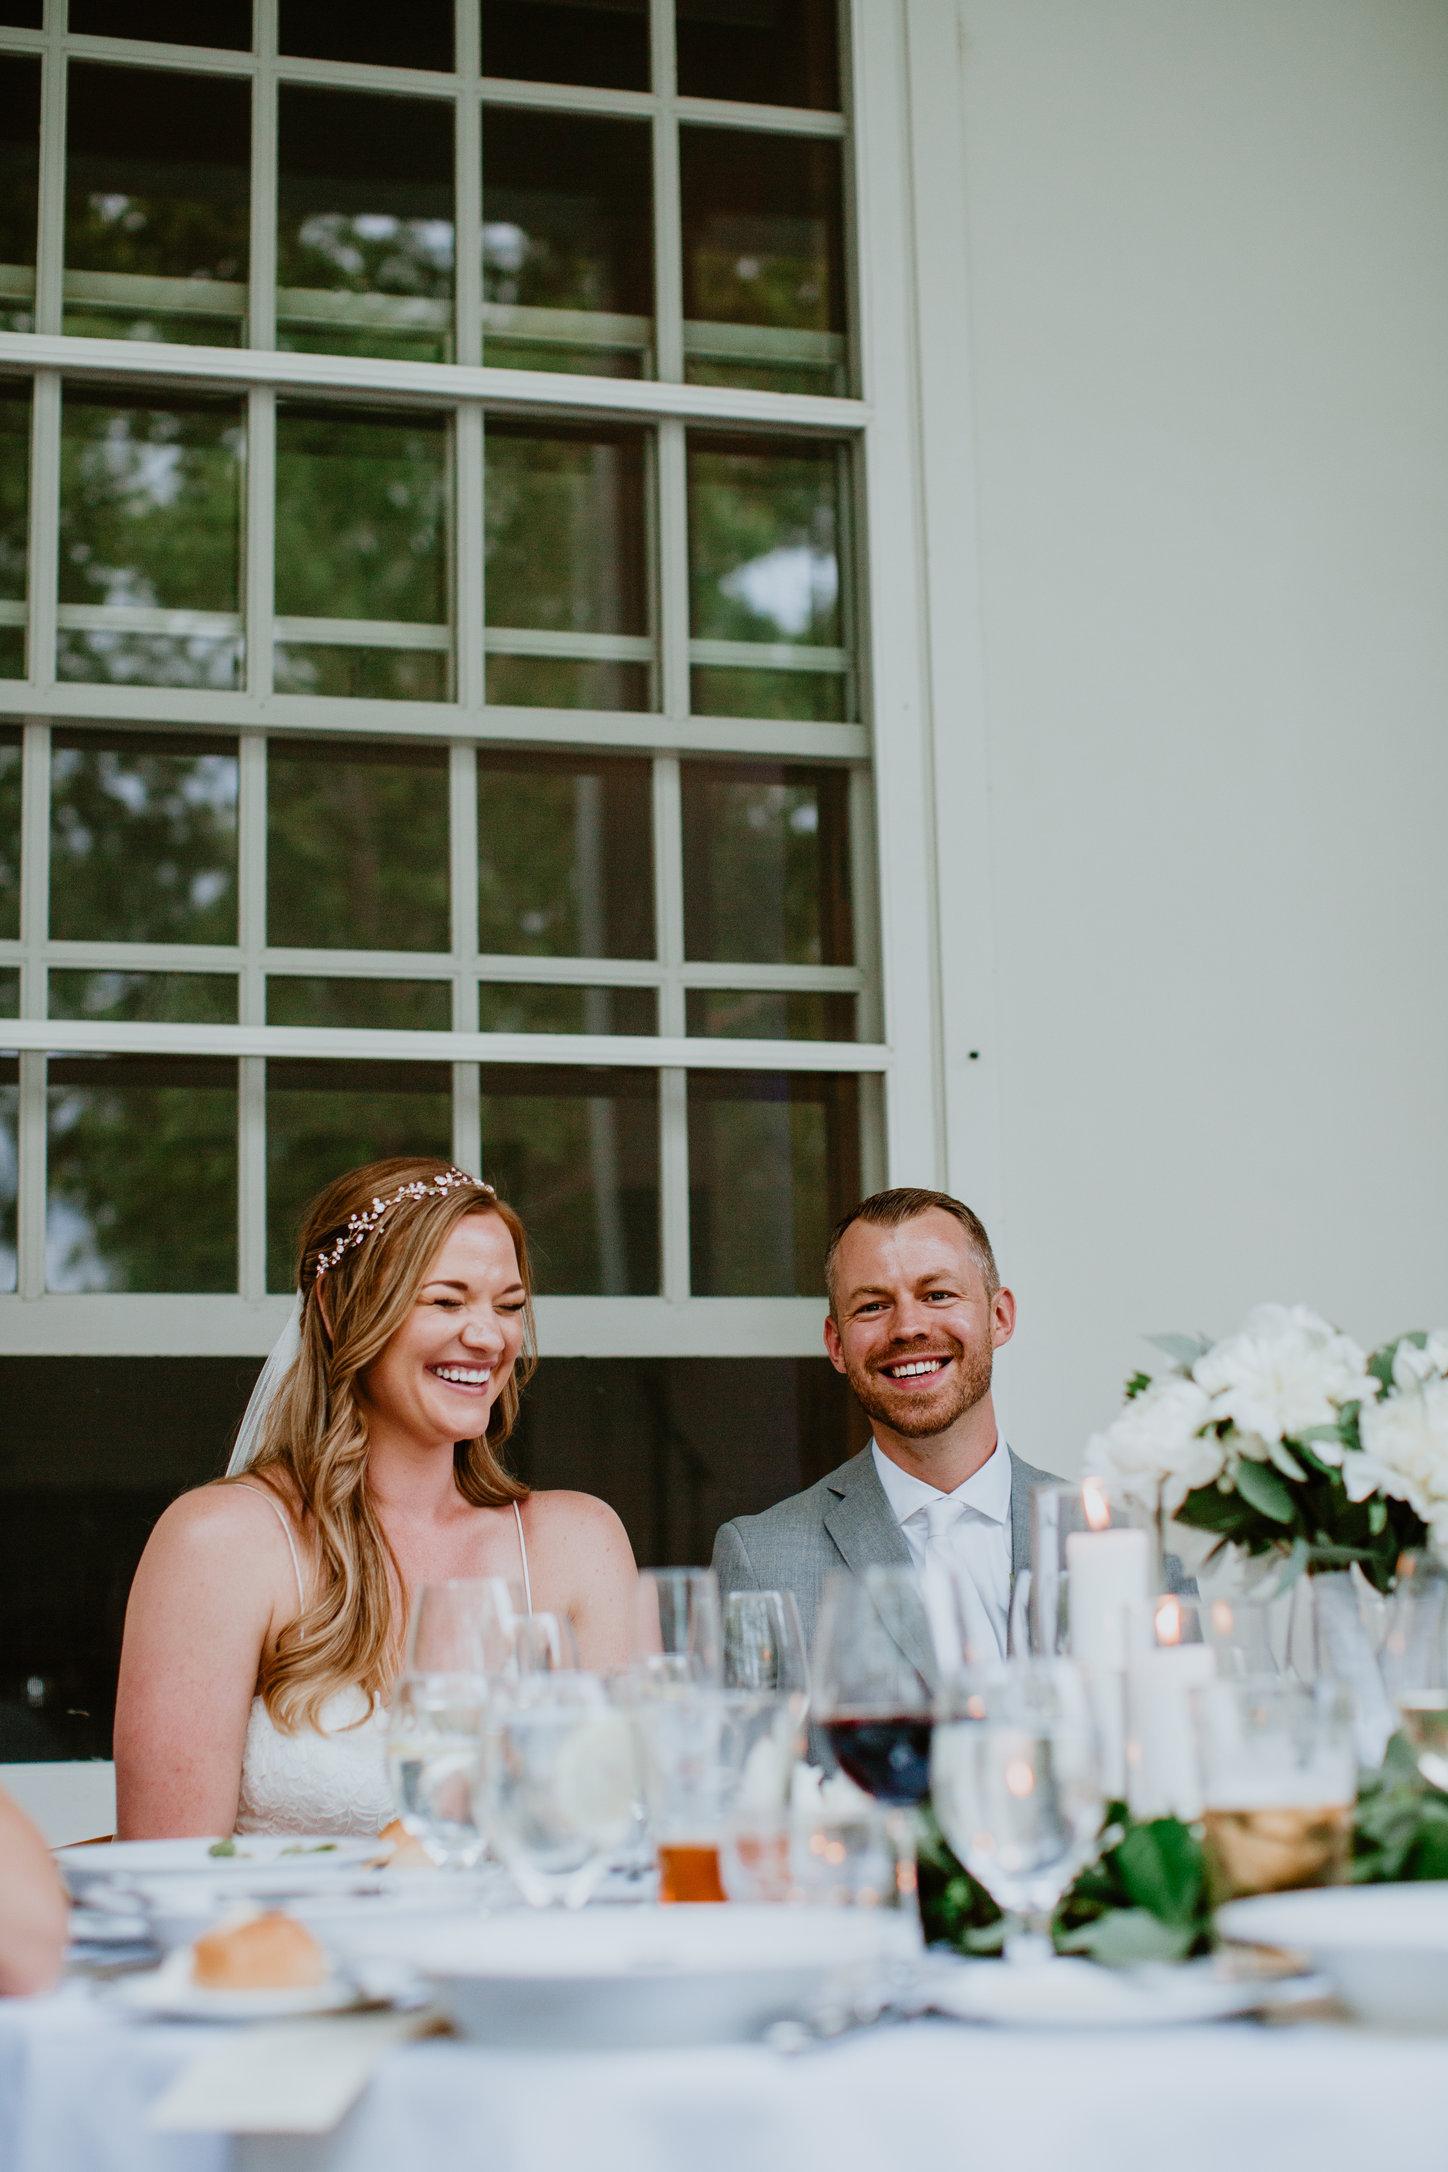 DandA-wedding-616.jpg